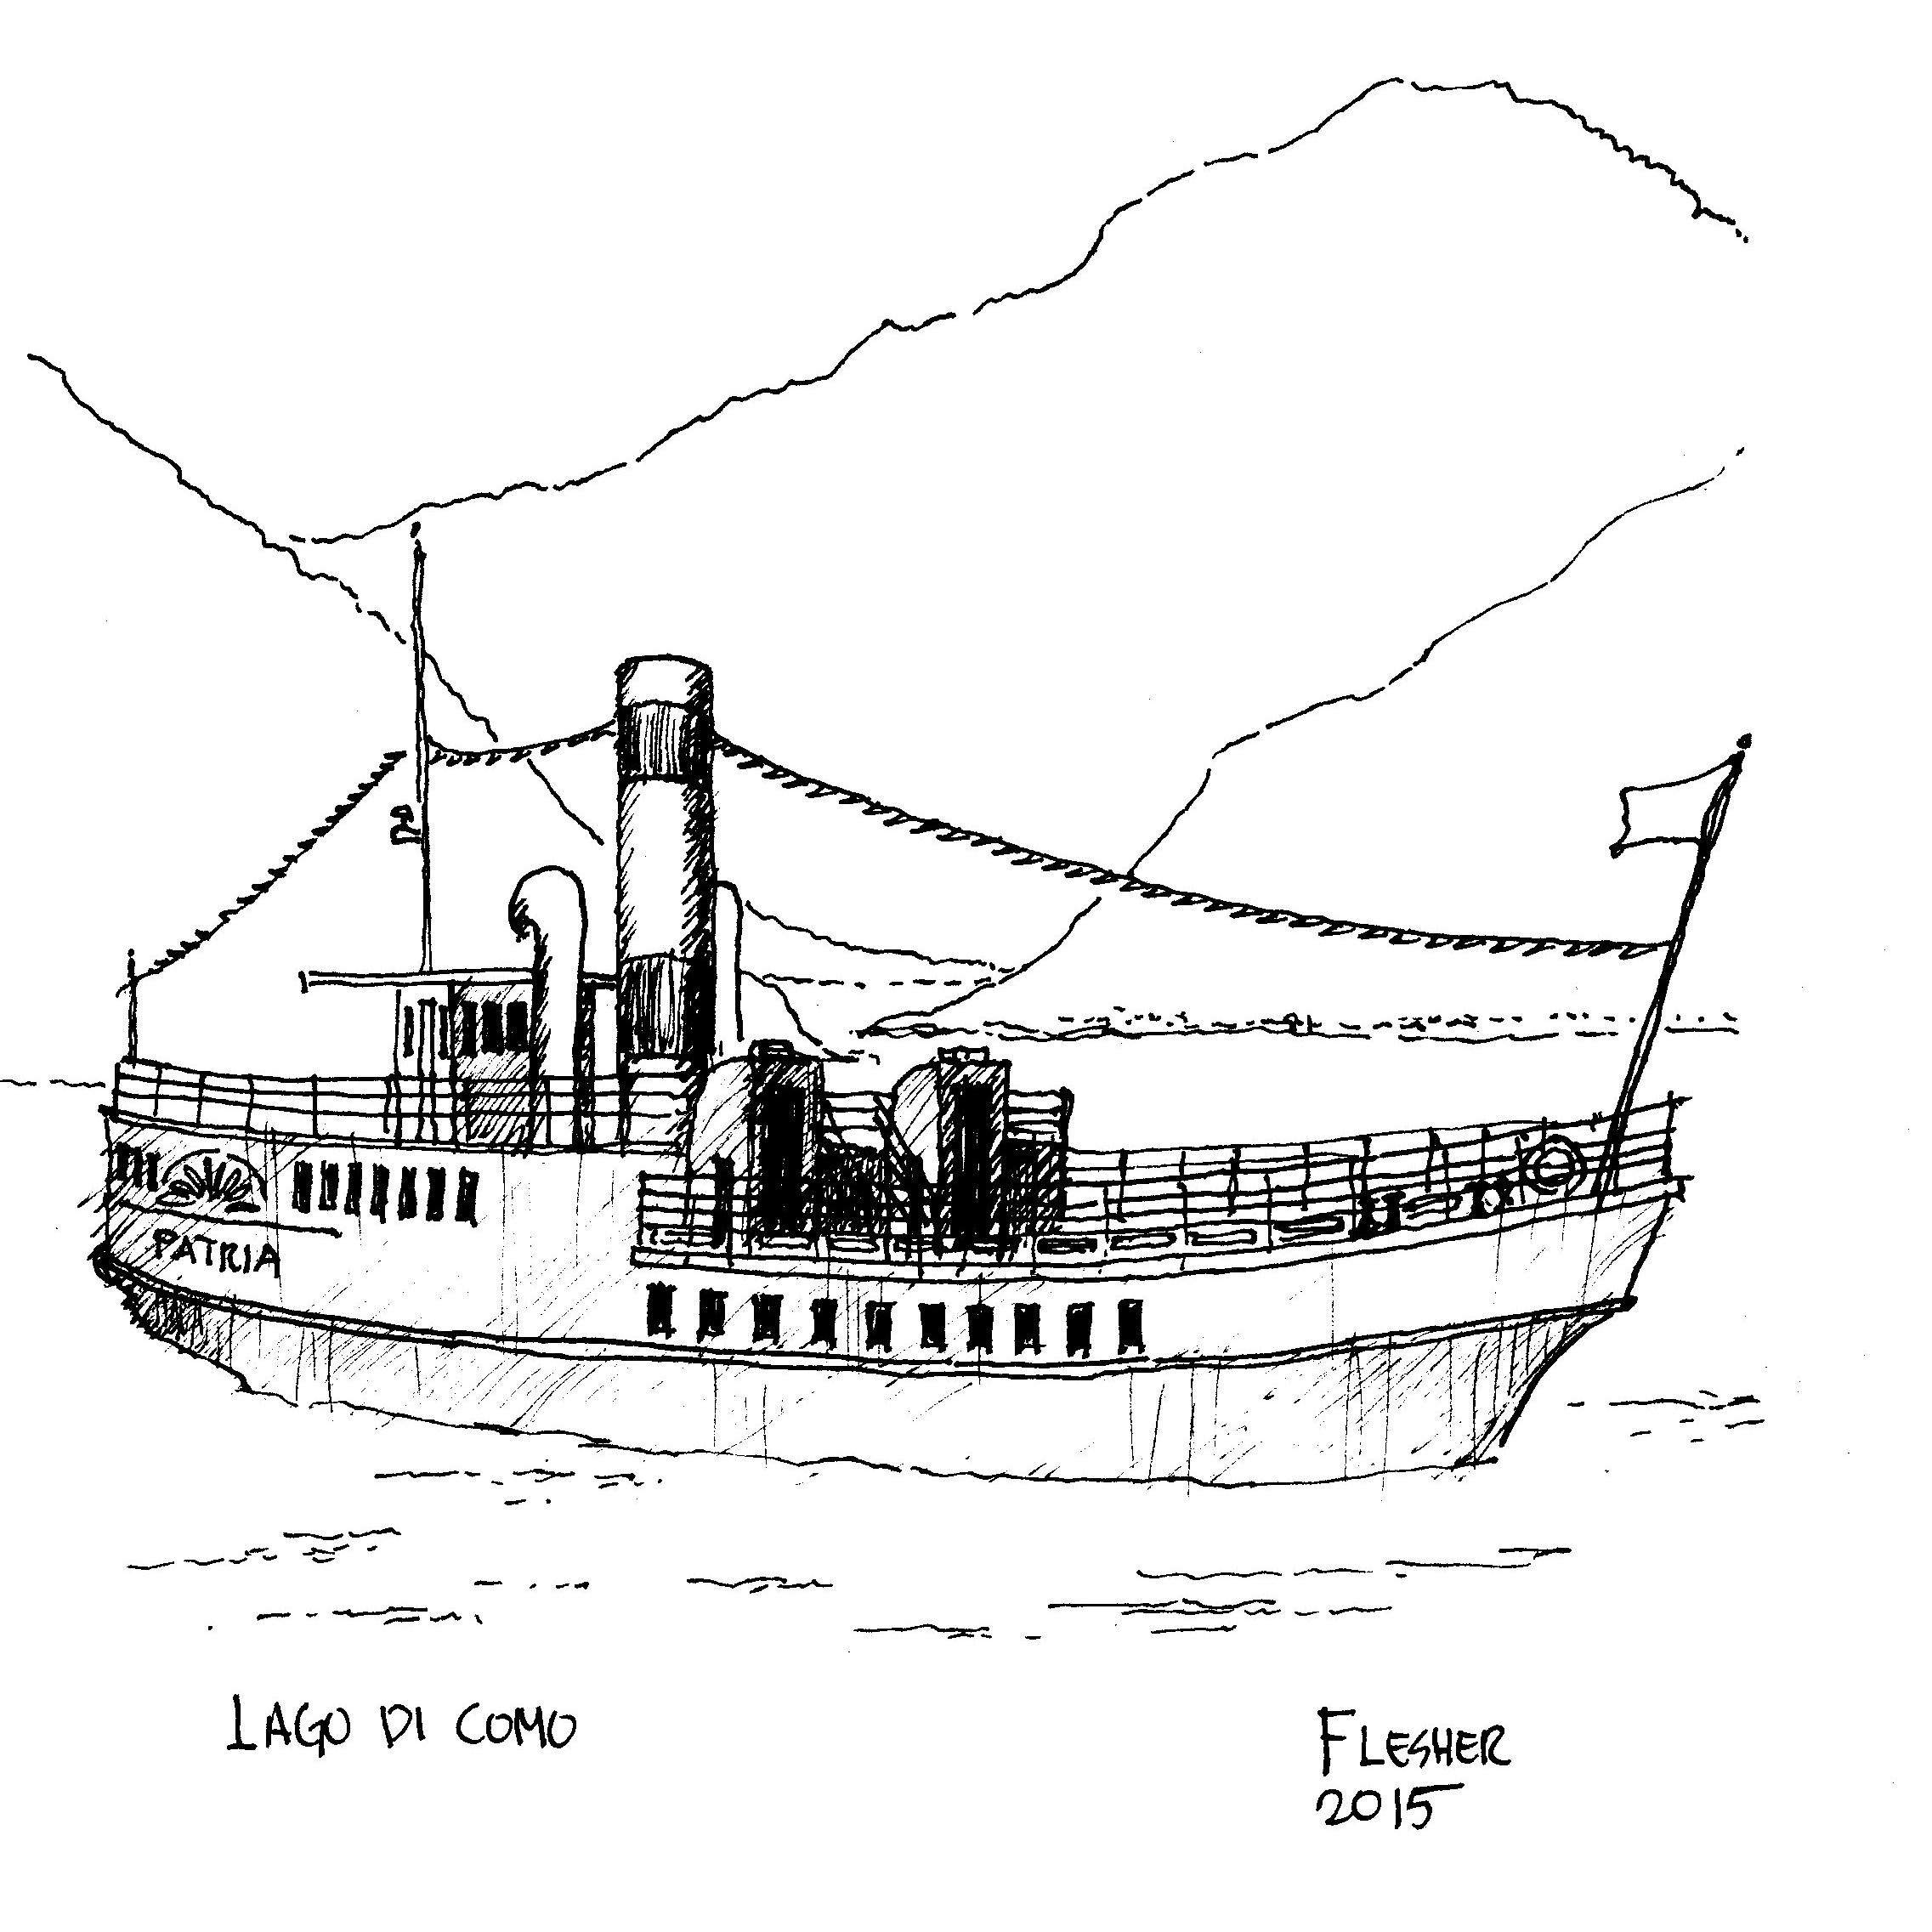 2273x2273 Lake Como Sketches Europe On 15 Espressos A Day